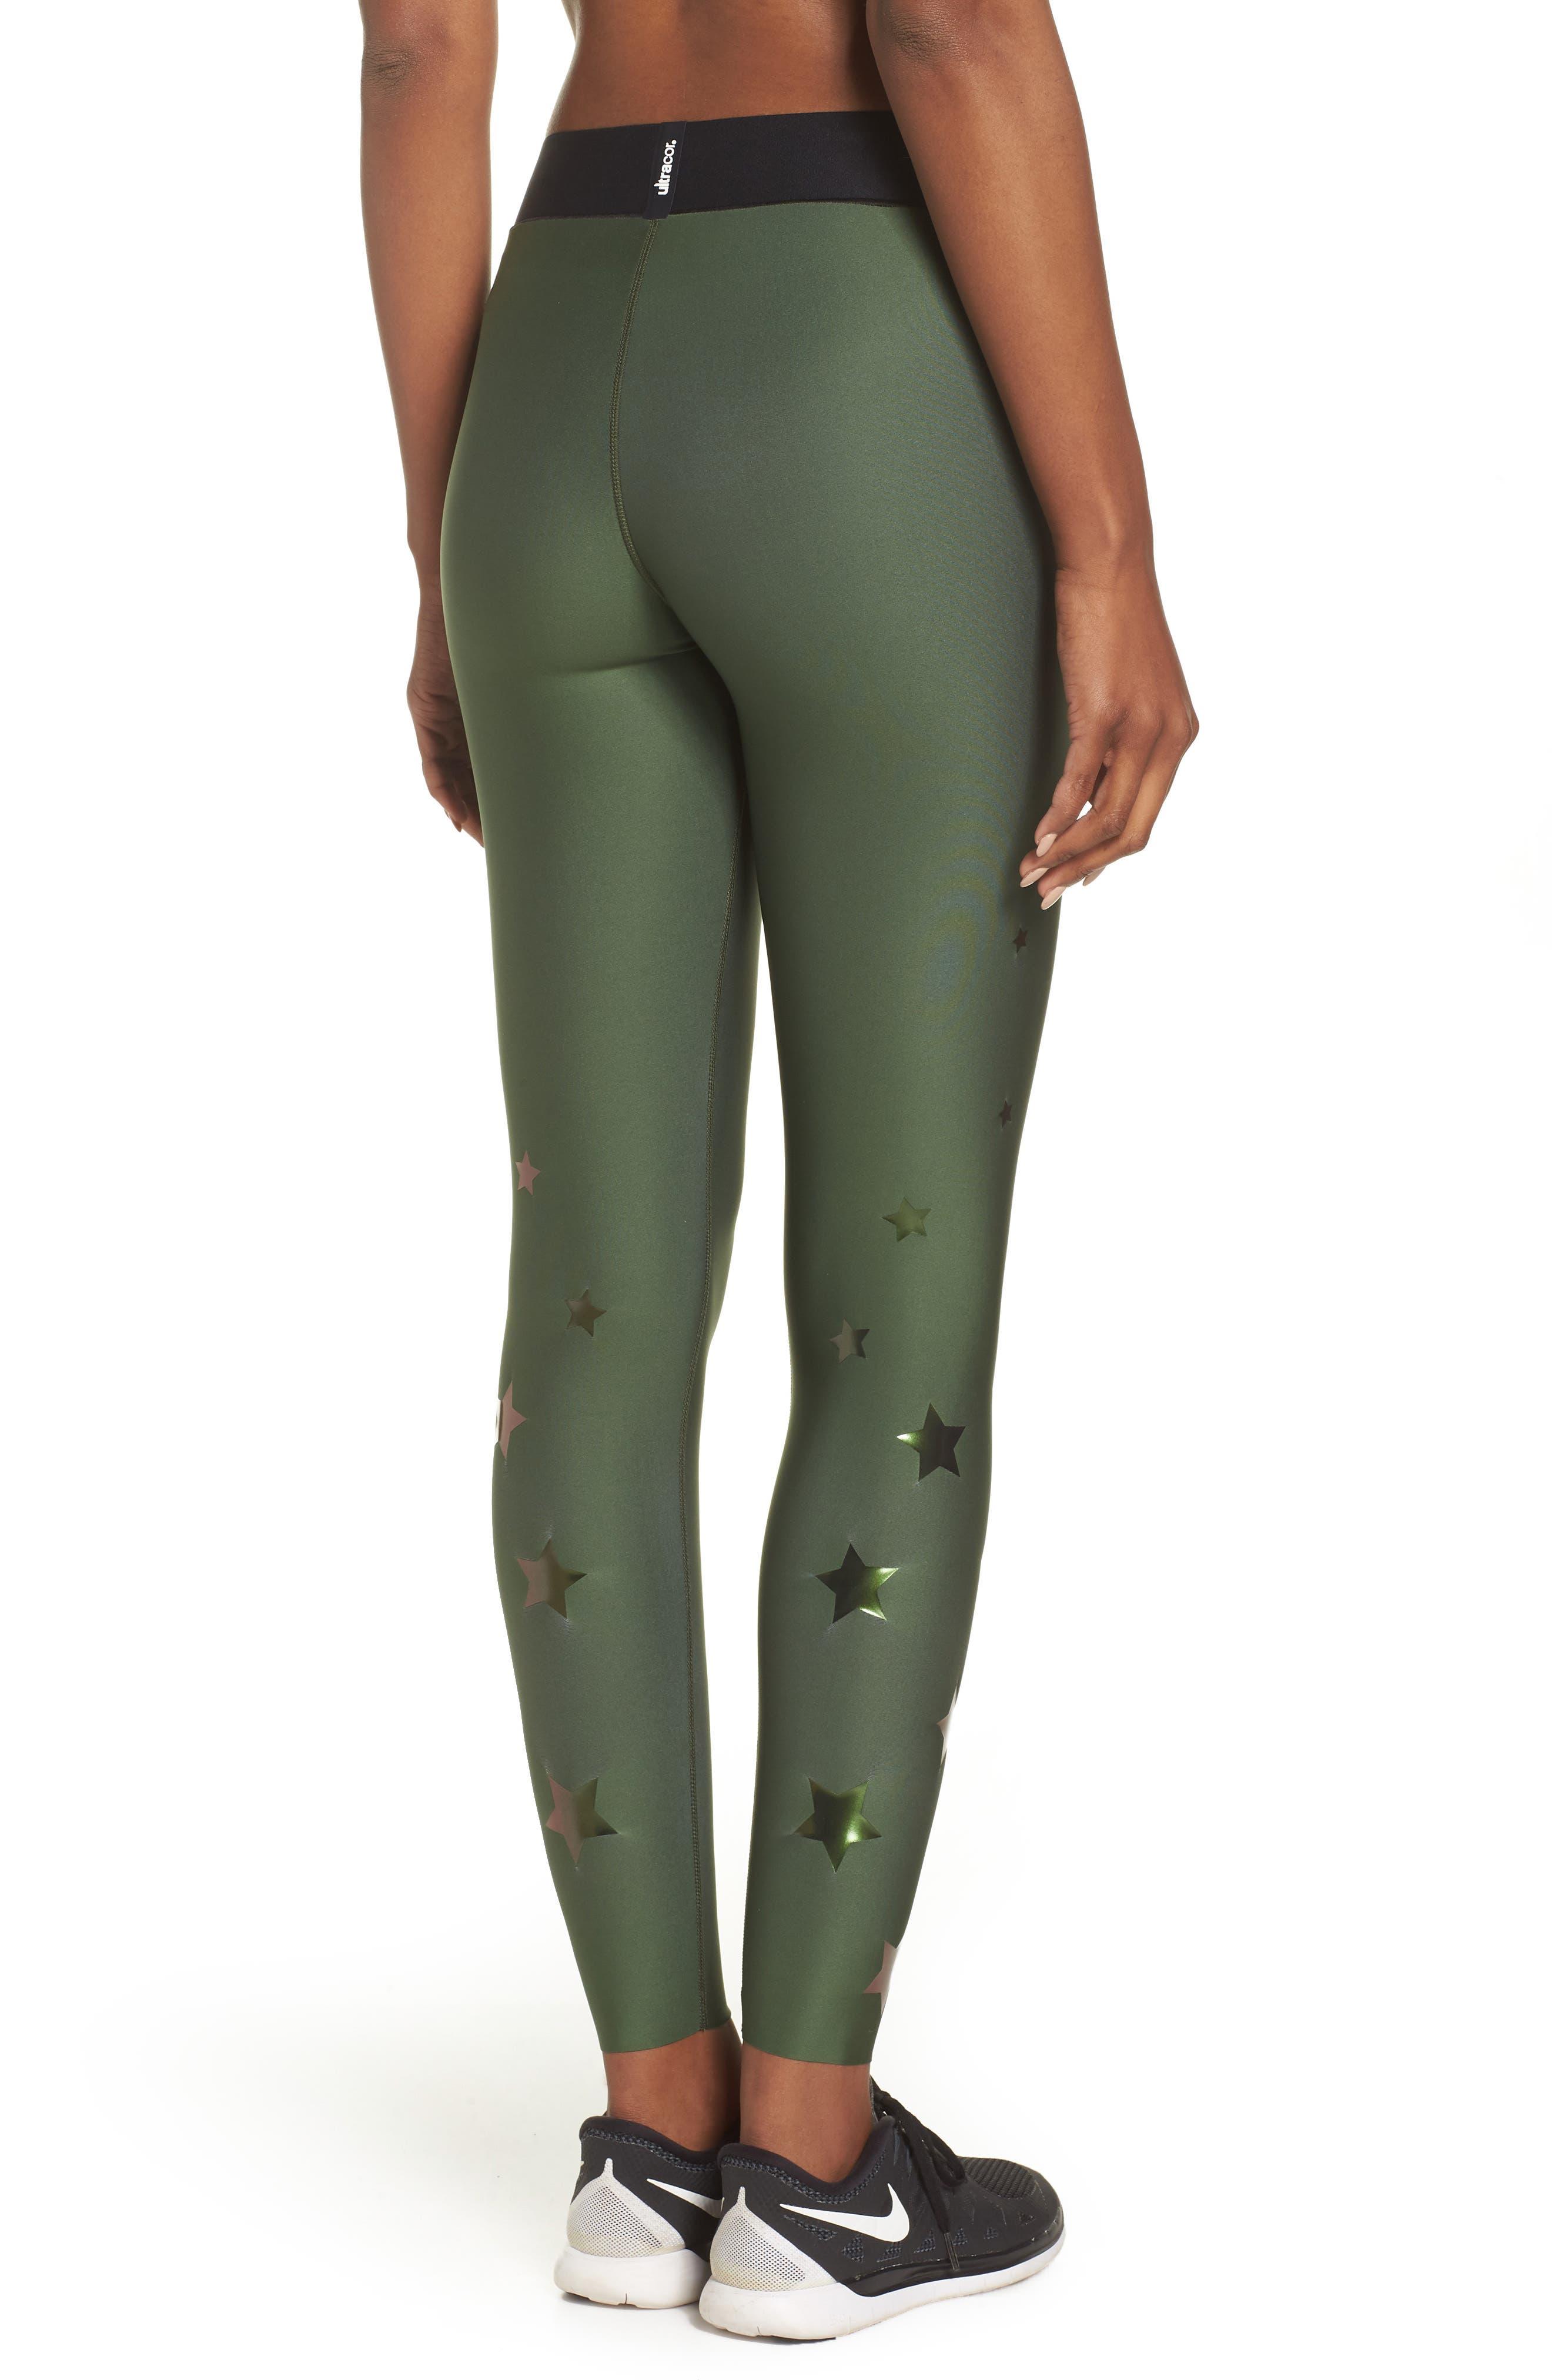 Ultra Luster Leggings,                             Alternate thumbnail 2, color,                             Army Green Beetle